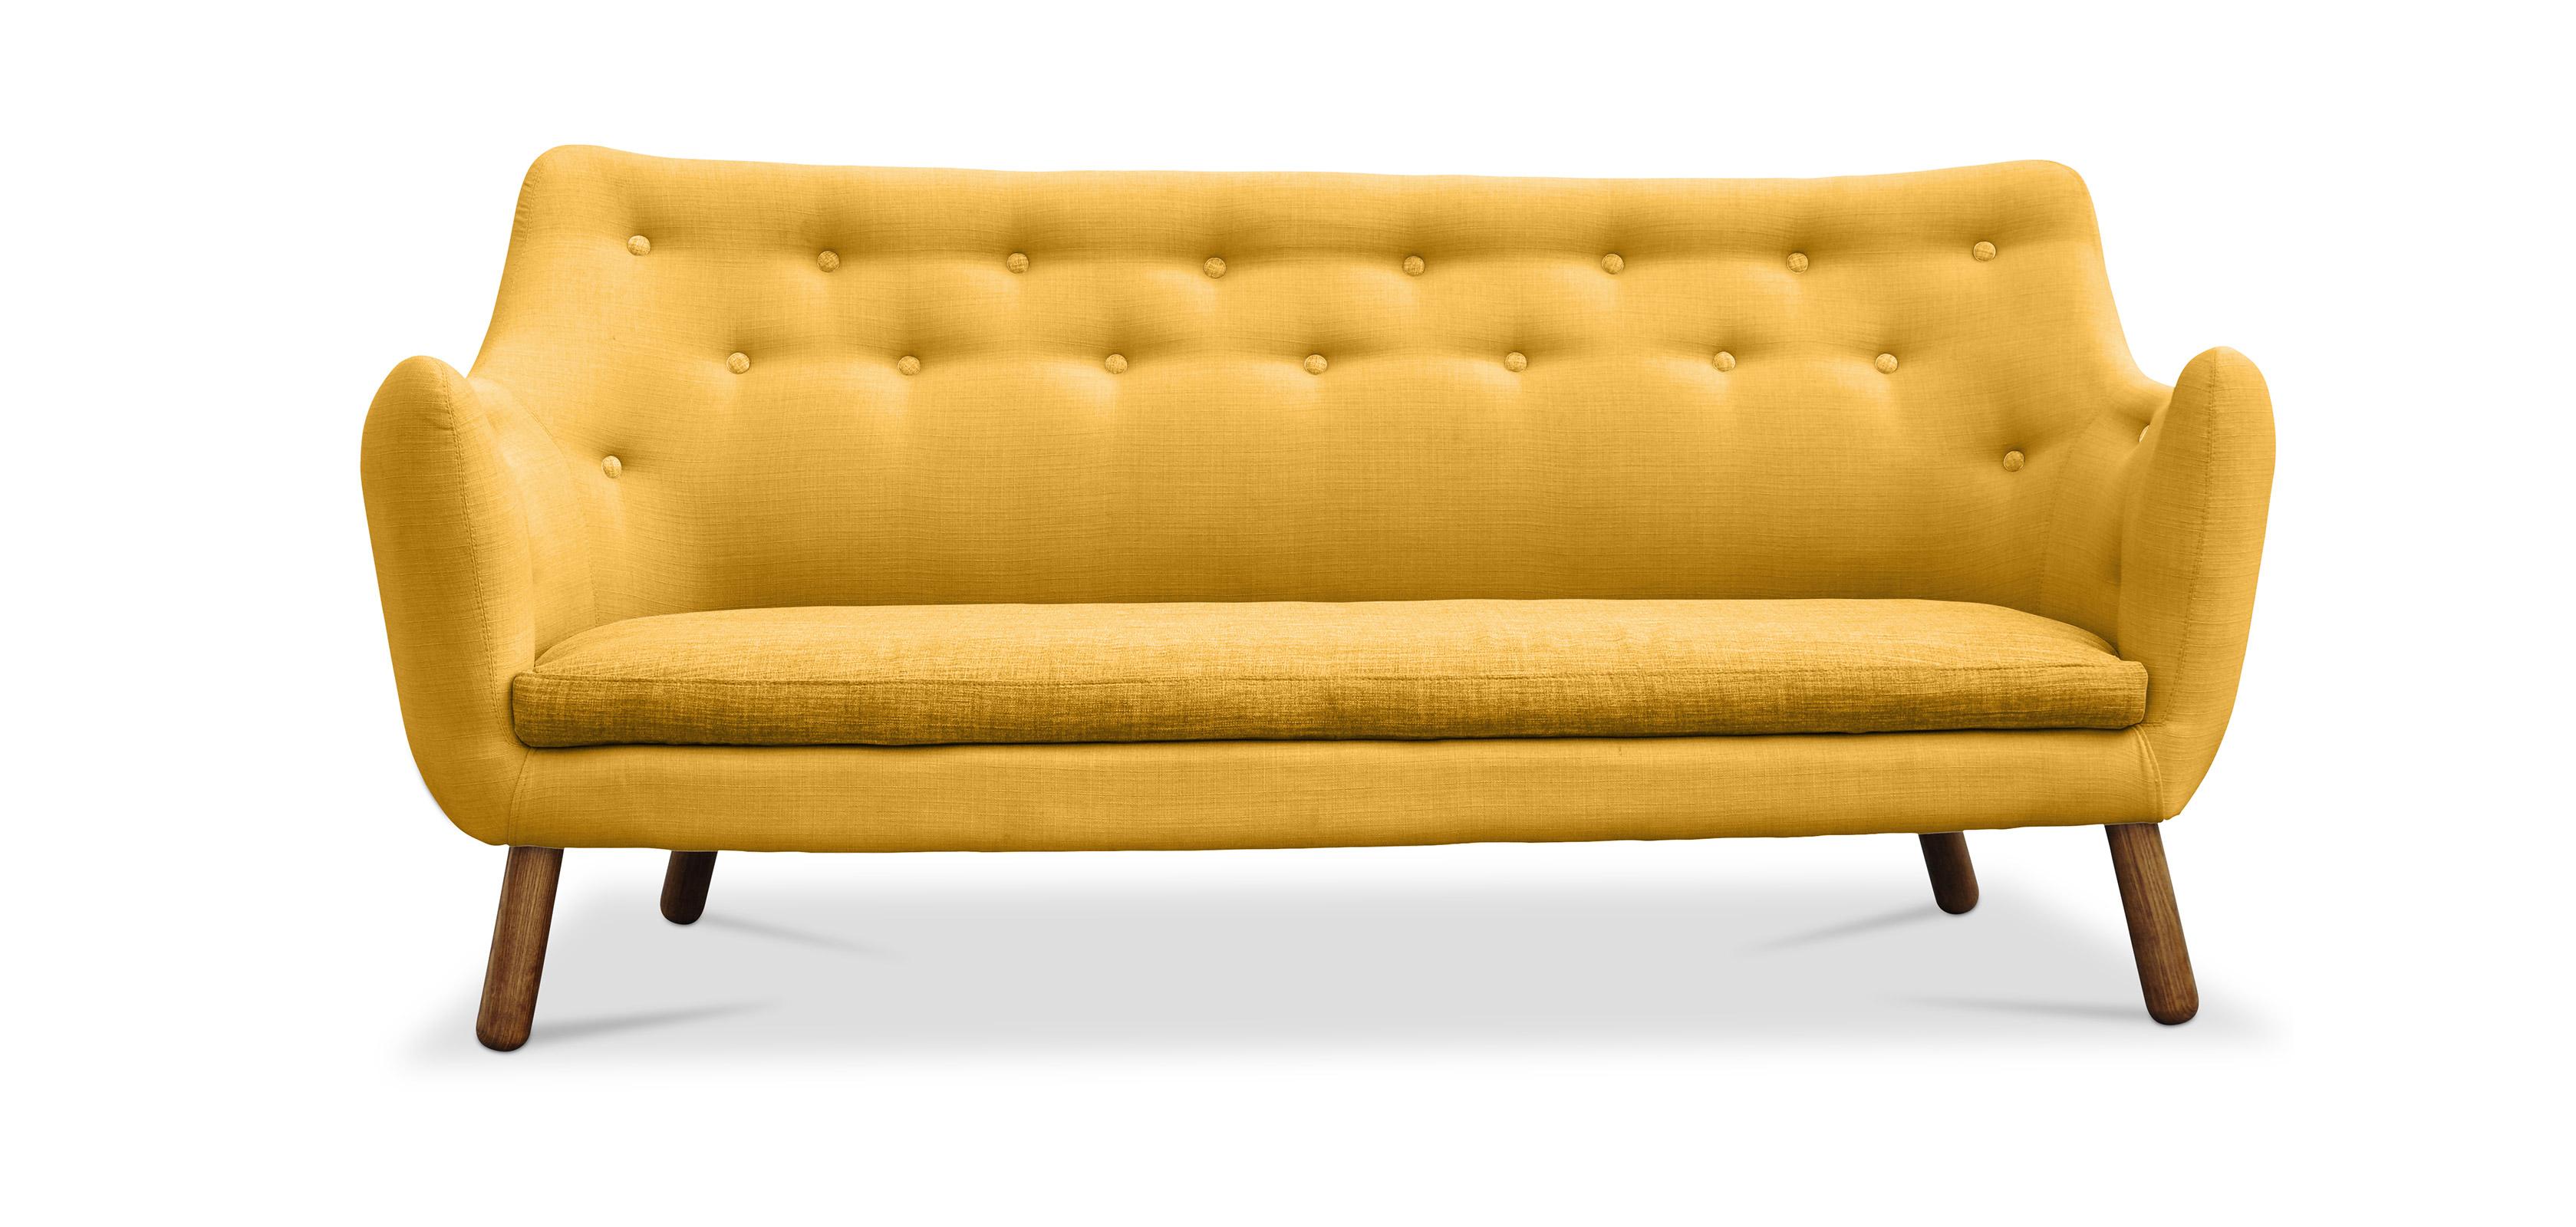 poet sofa 3 sitzer skandinavisches design stoff. Black Bedroom Furniture Sets. Home Design Ideas